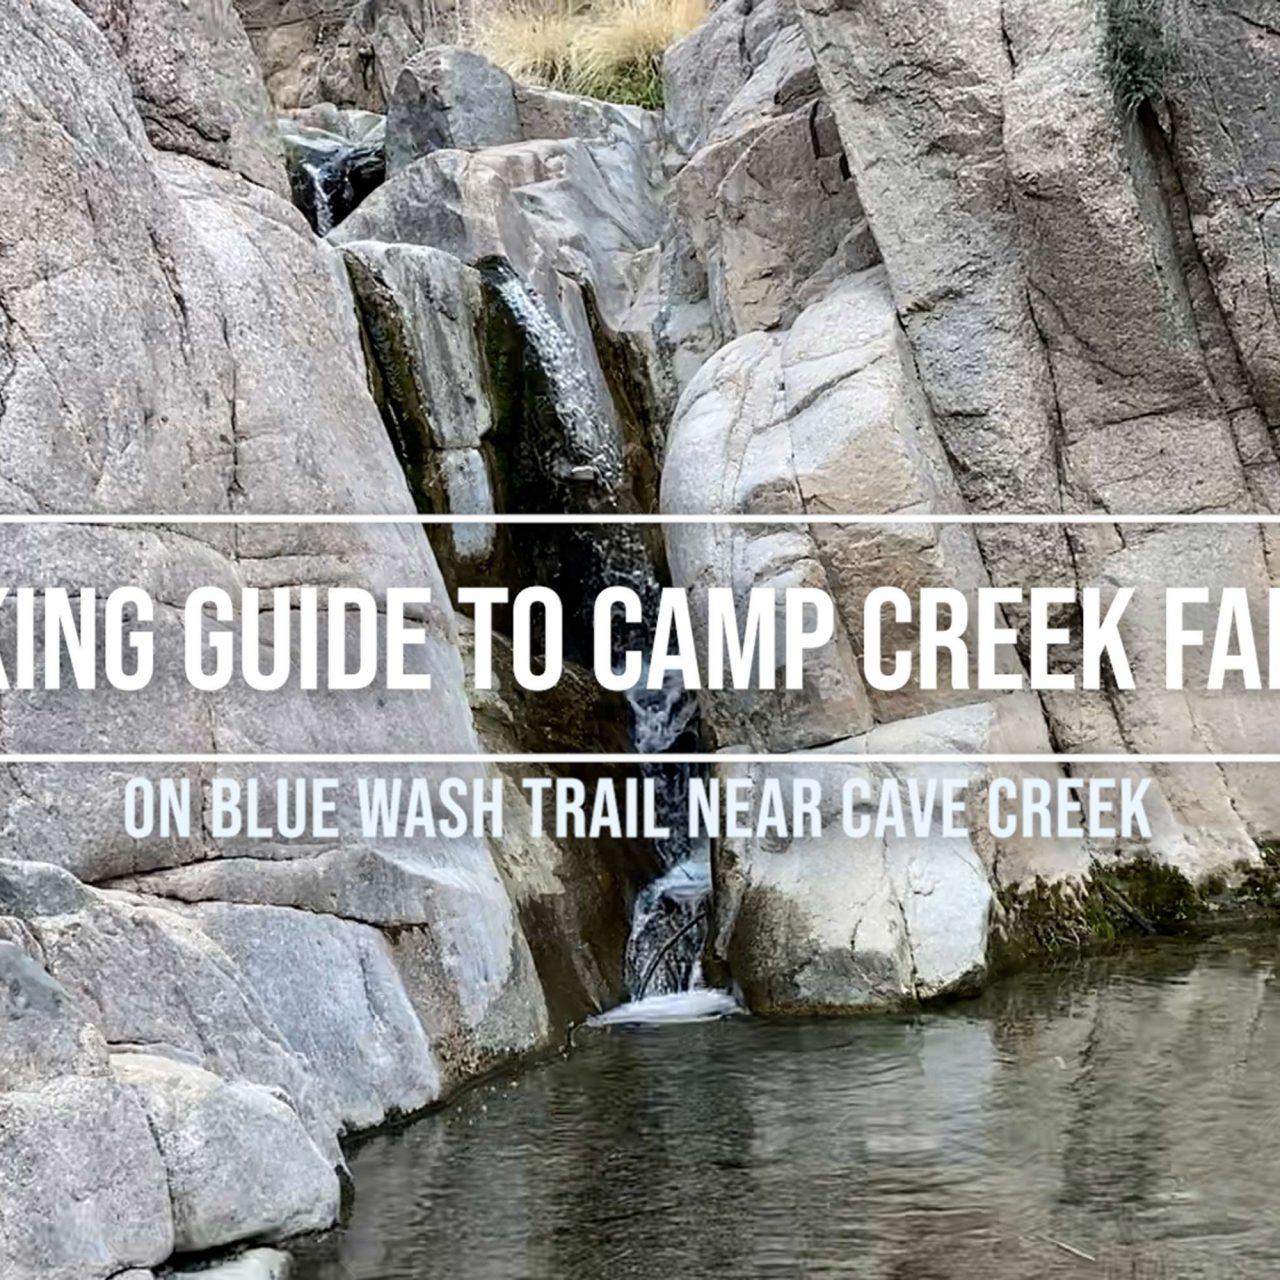 Hiking Guide to Camp Creek Falls – Blue Wash Trail near Cave Creek